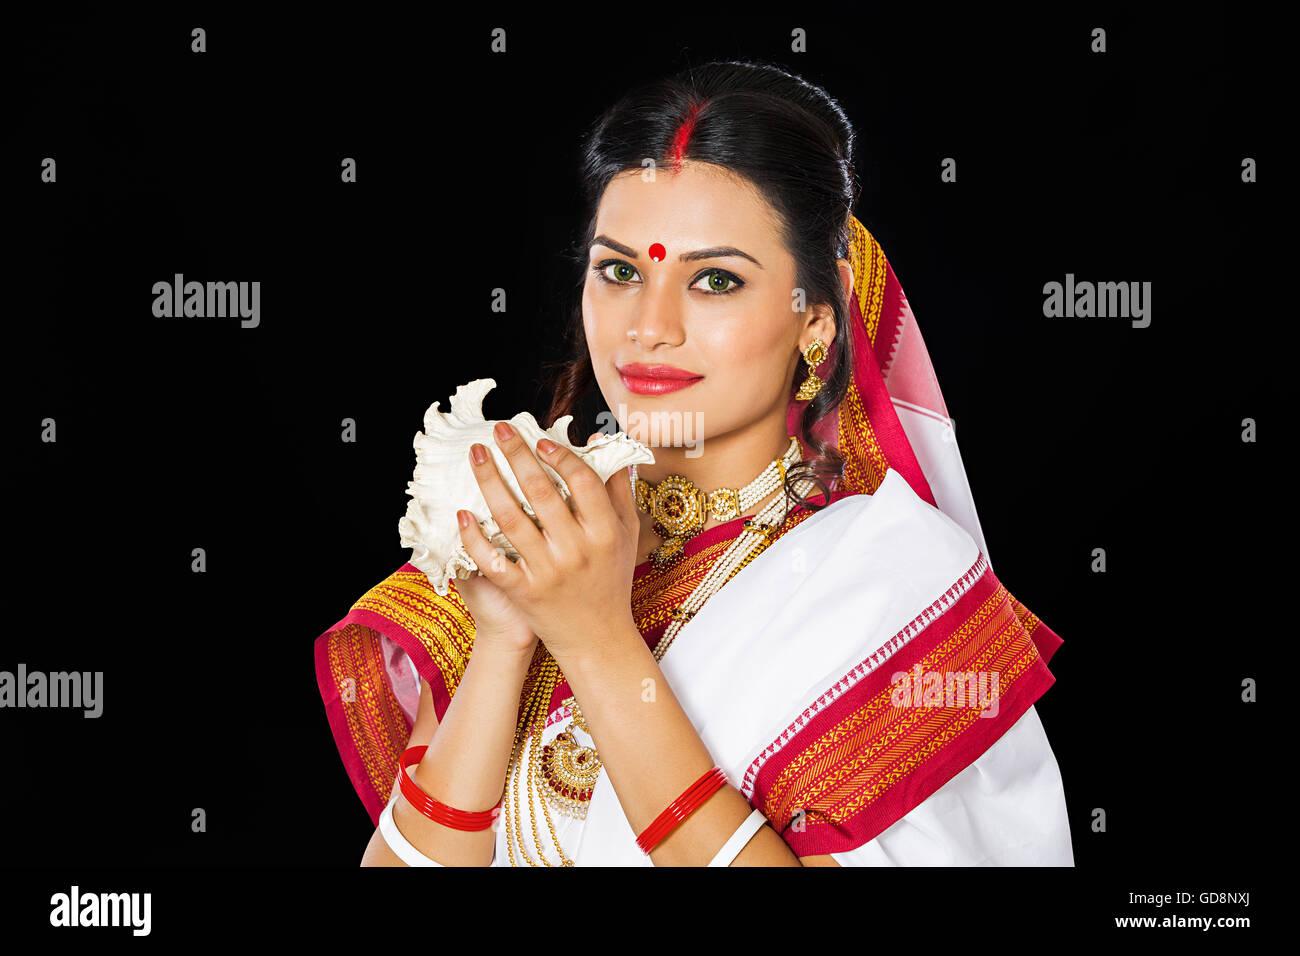 Bengali adult picture